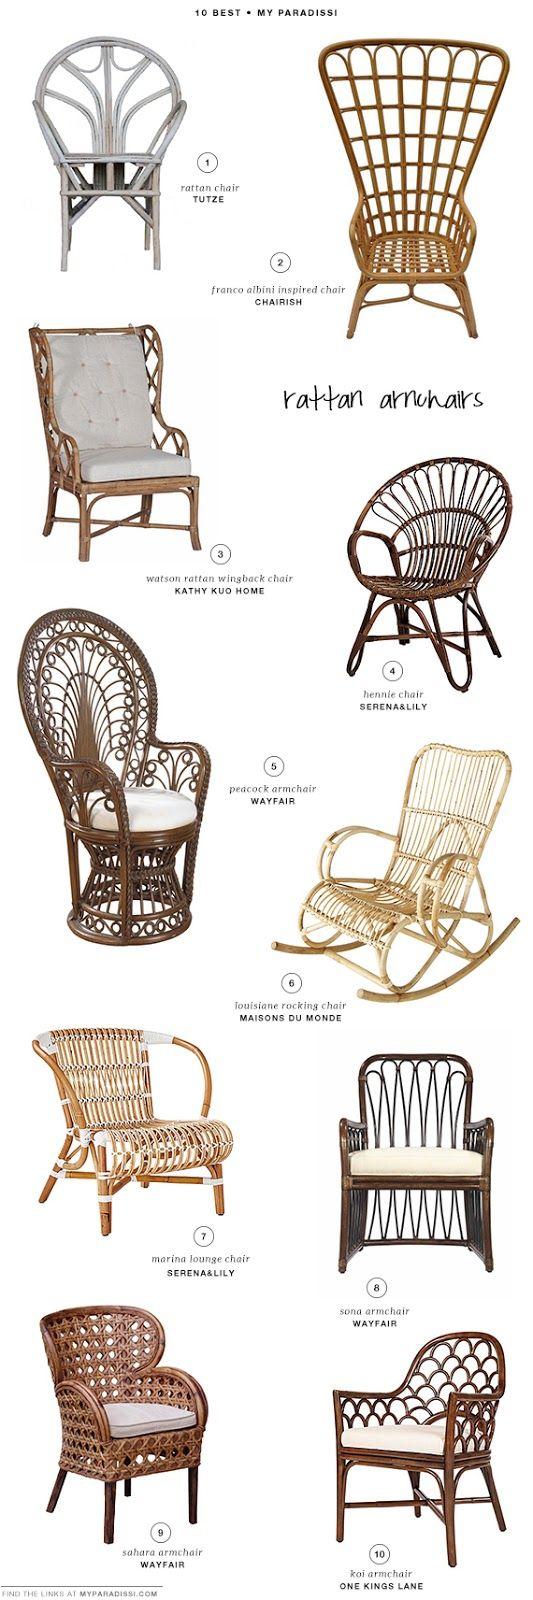 Poltrone In Vimini Da Interno 10 best: rattan armchairs | sedia vimini, vimini, sedie